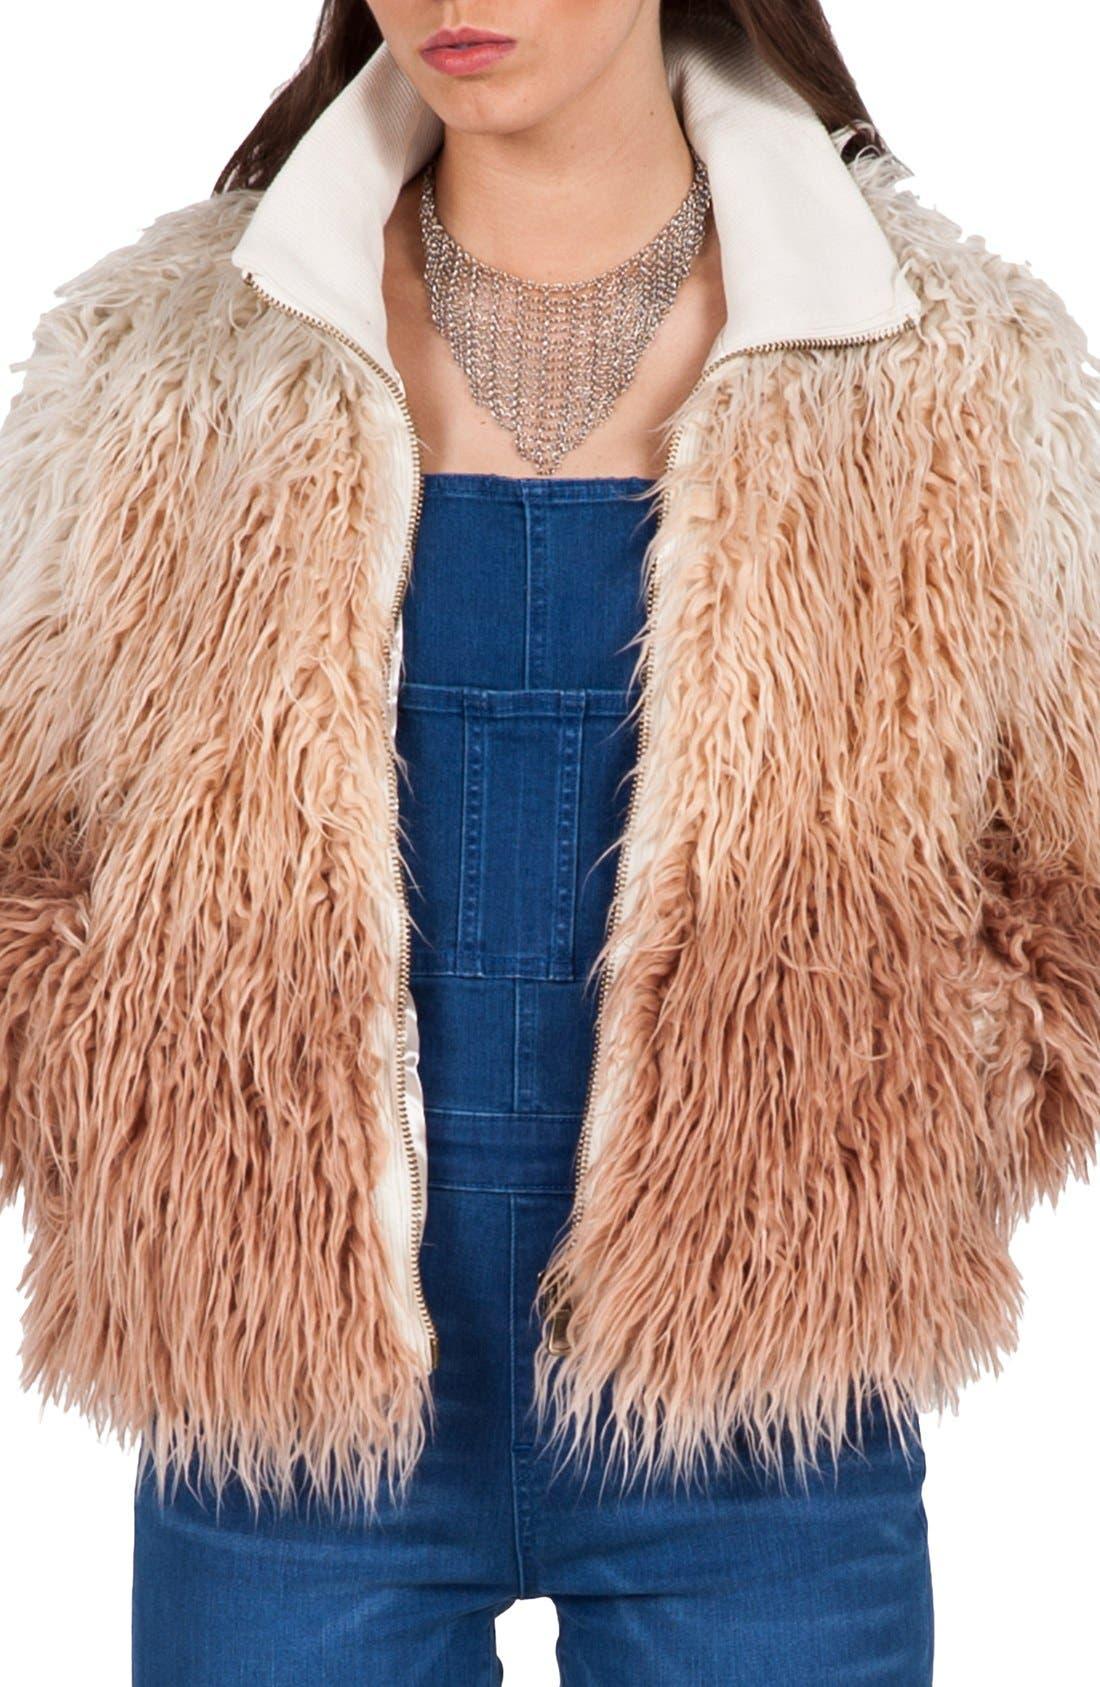 Alternate Image 1 Selected - Volcom 'Furrankie' Faux Fur Jacket